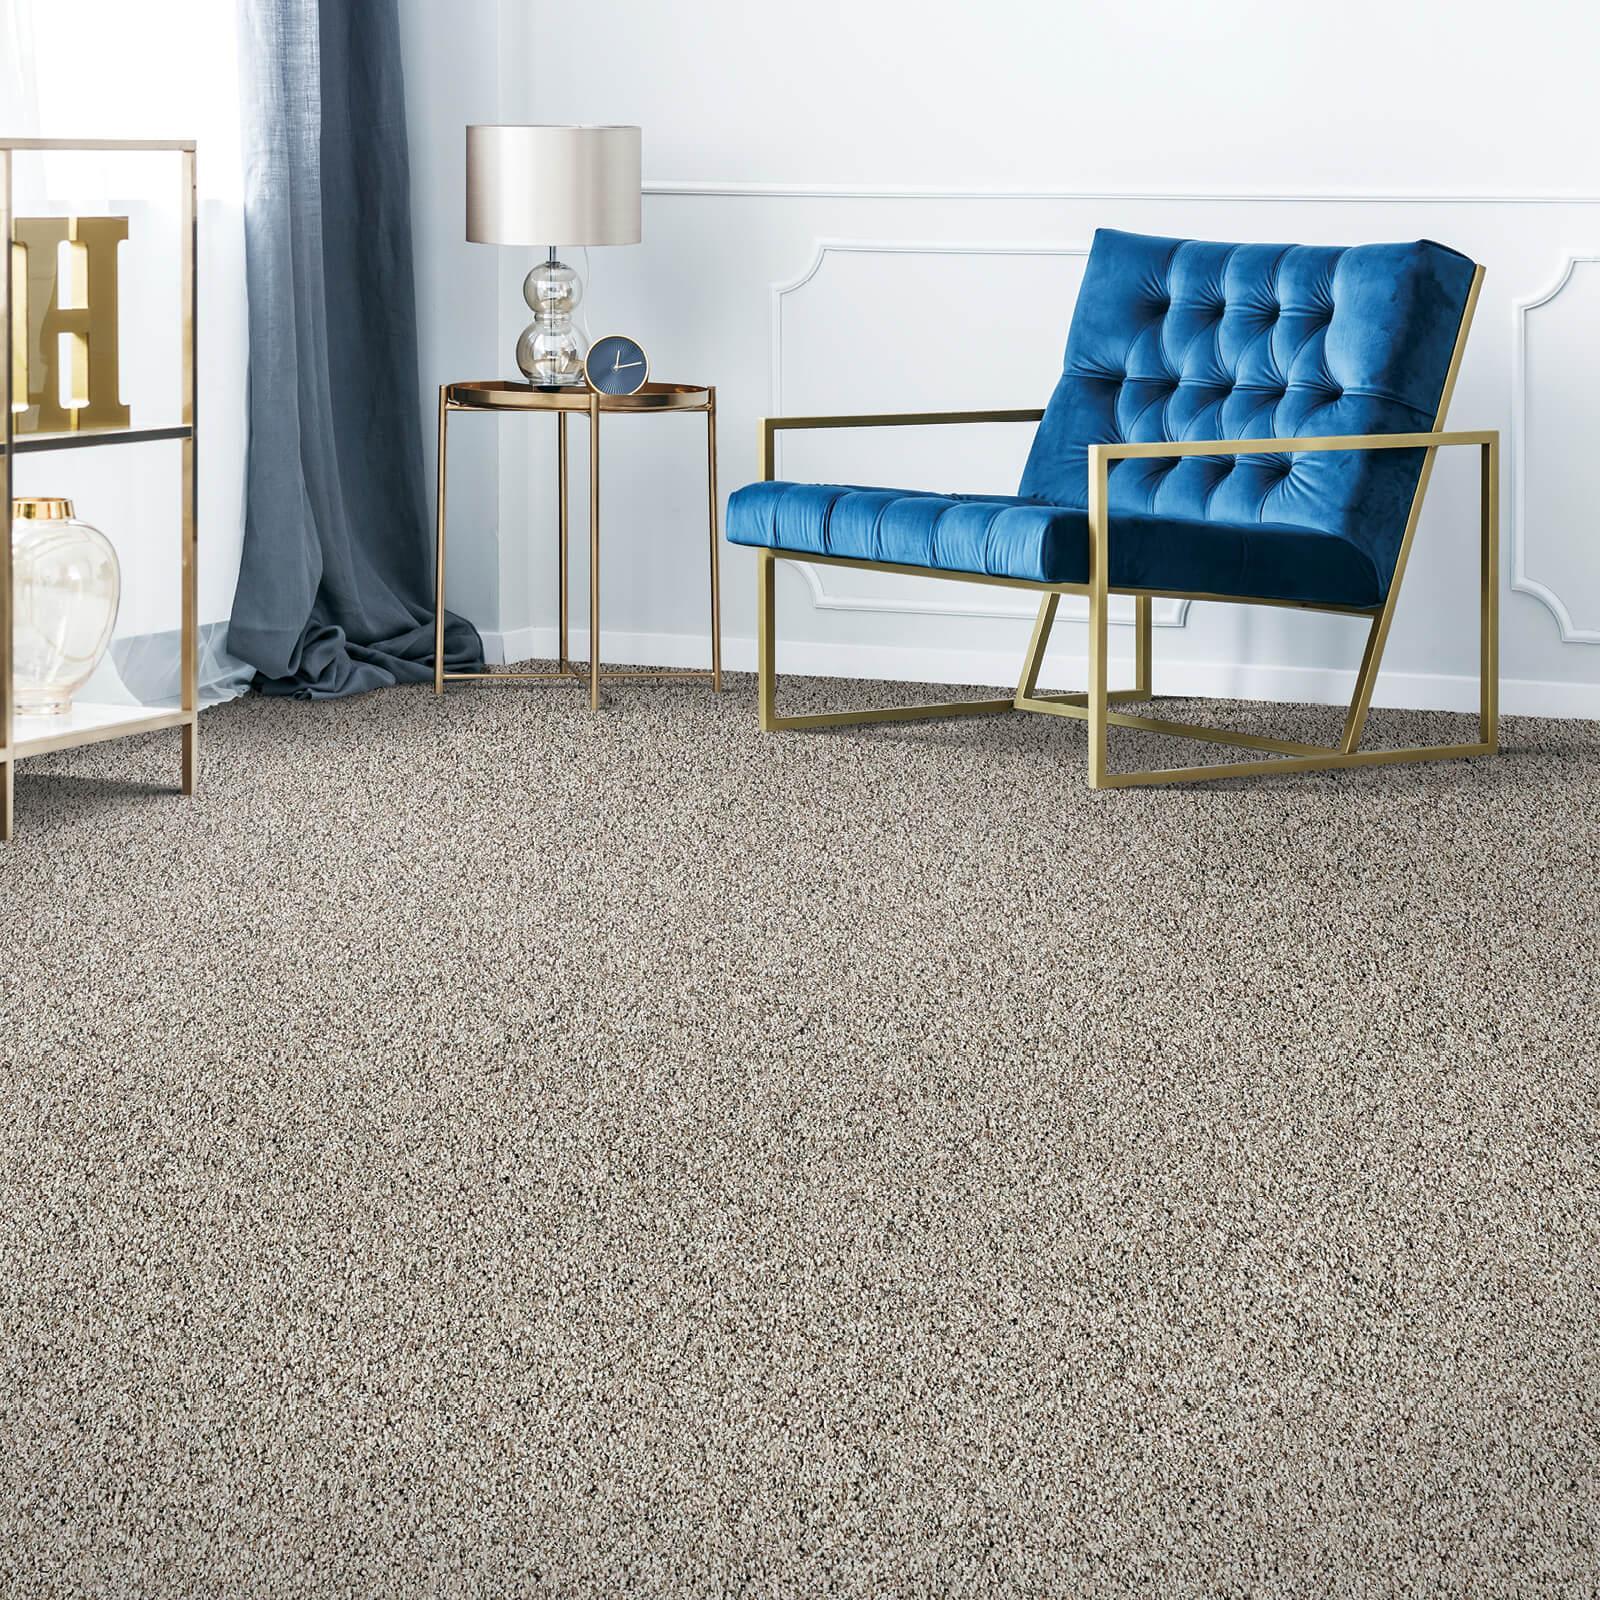 Choose Carpet For Allergies, Paneling Factory Of Virginia